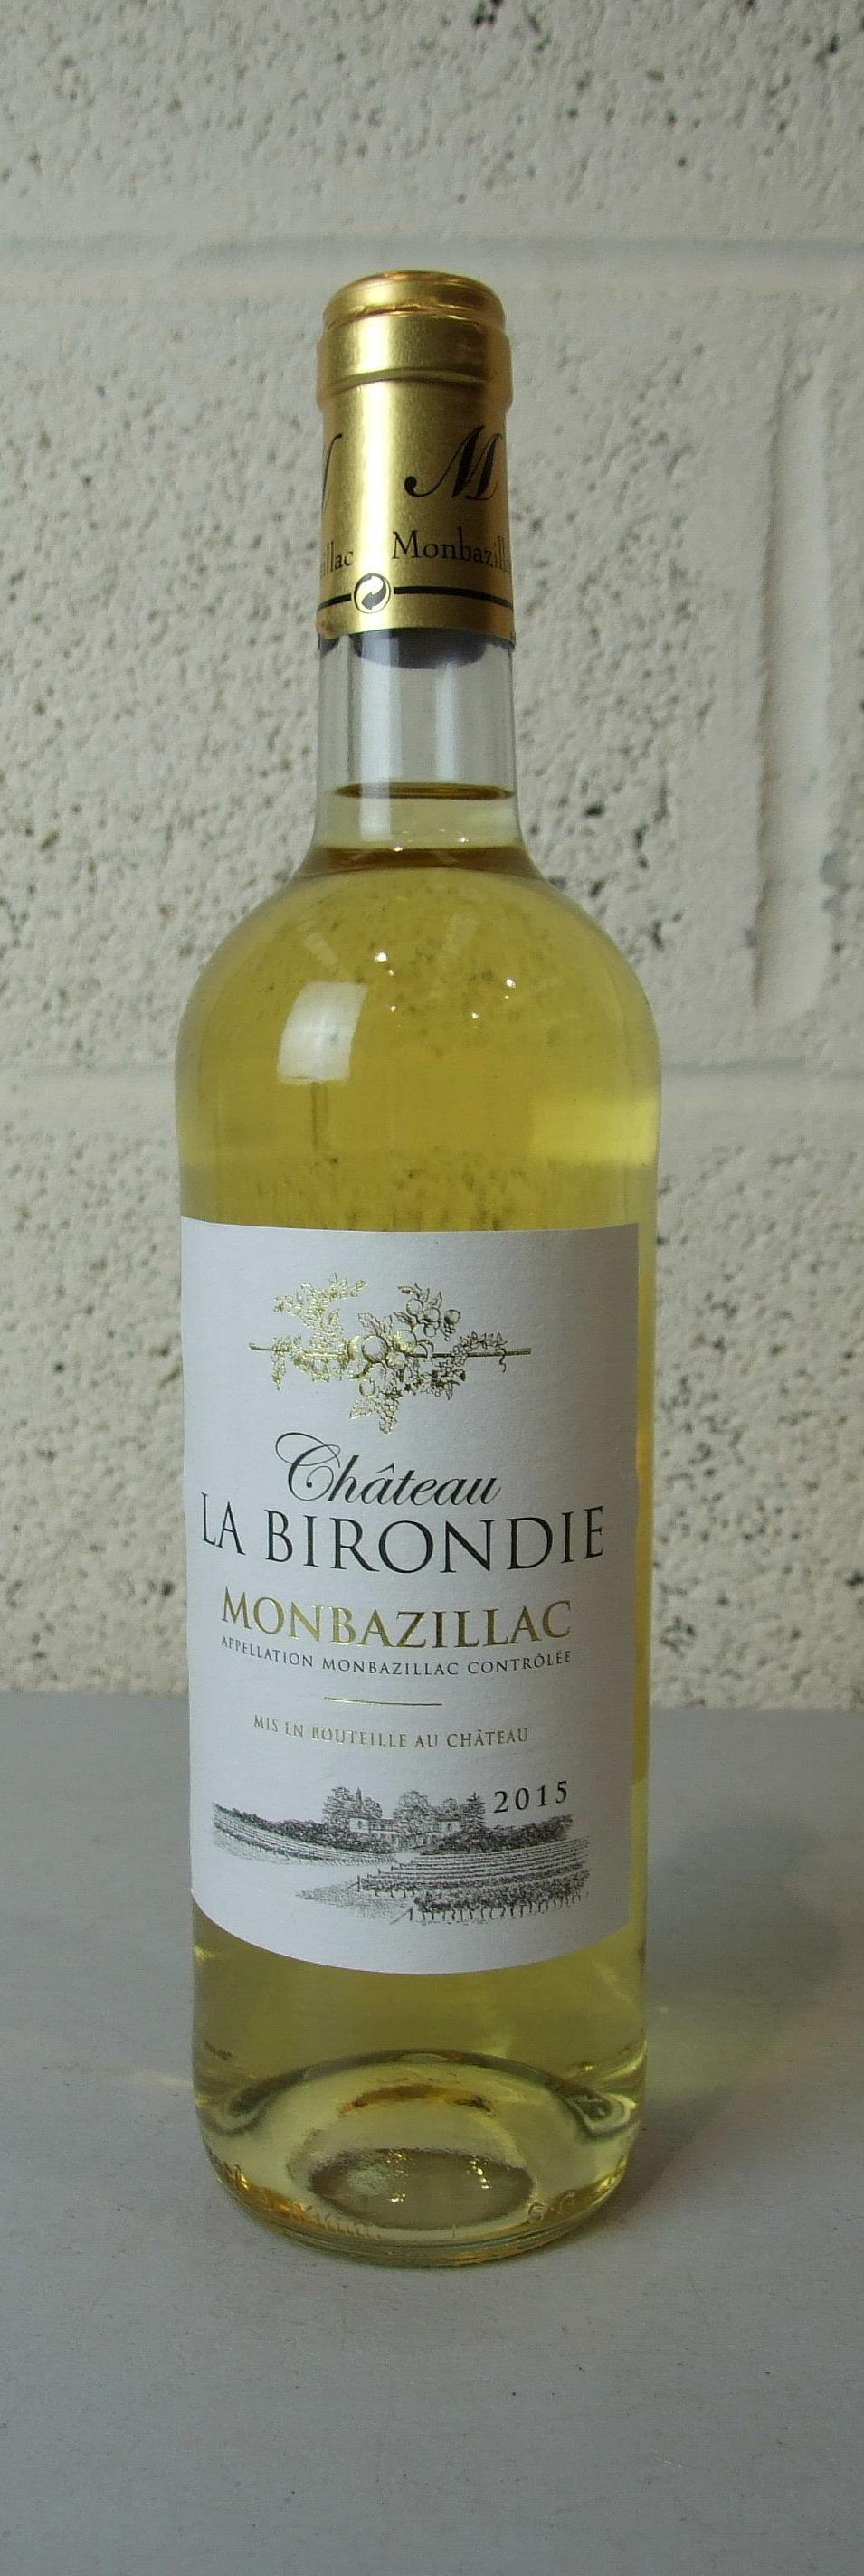 Lot 56 - France Monbazillac, la Birondie, nine bottles, (9)